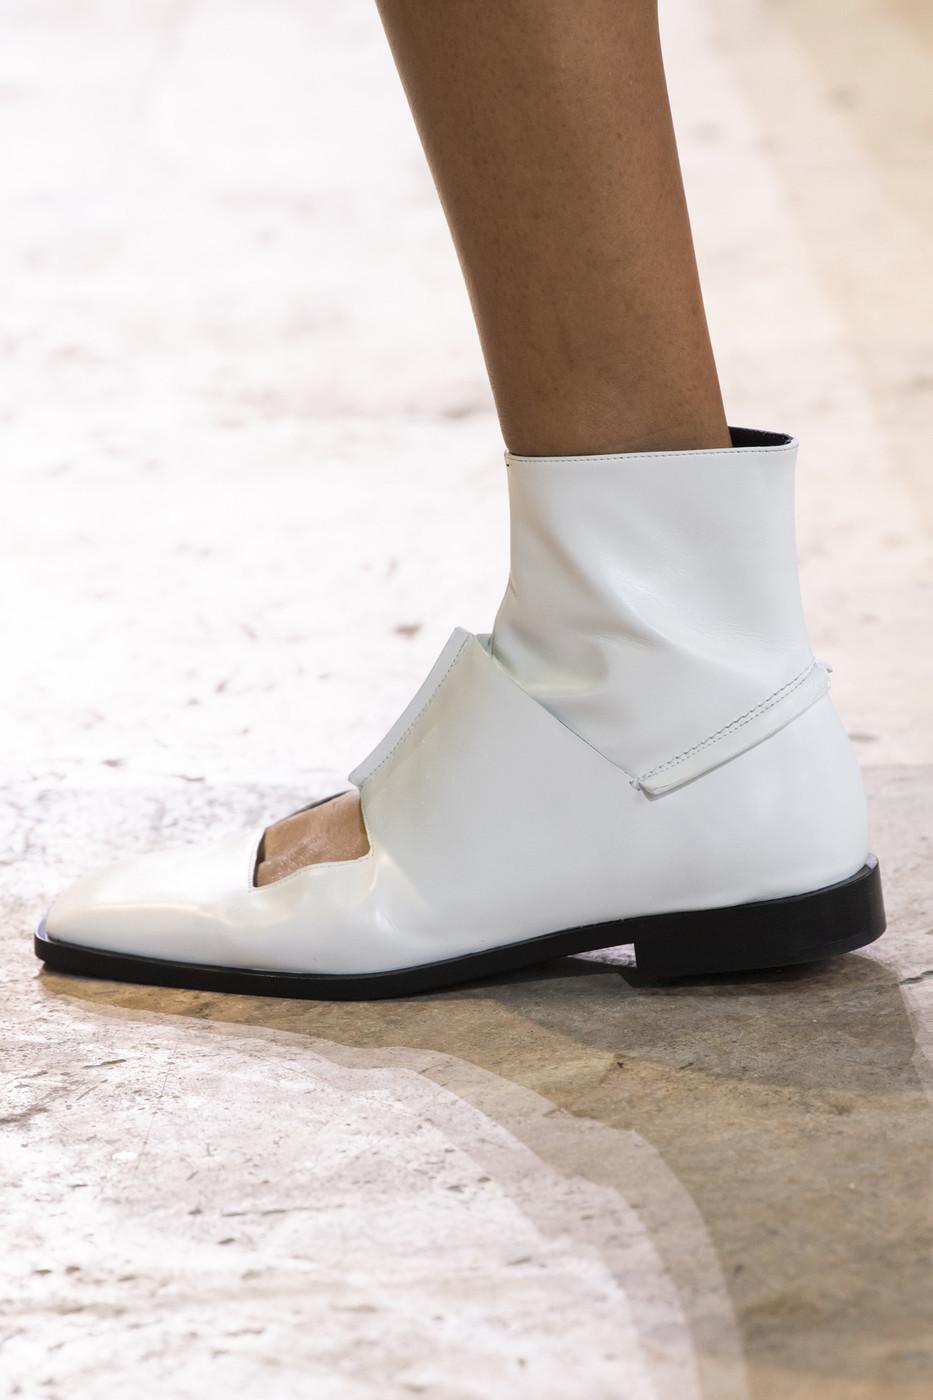 Nina Ricci at Paris Fashion Week Spring 2020